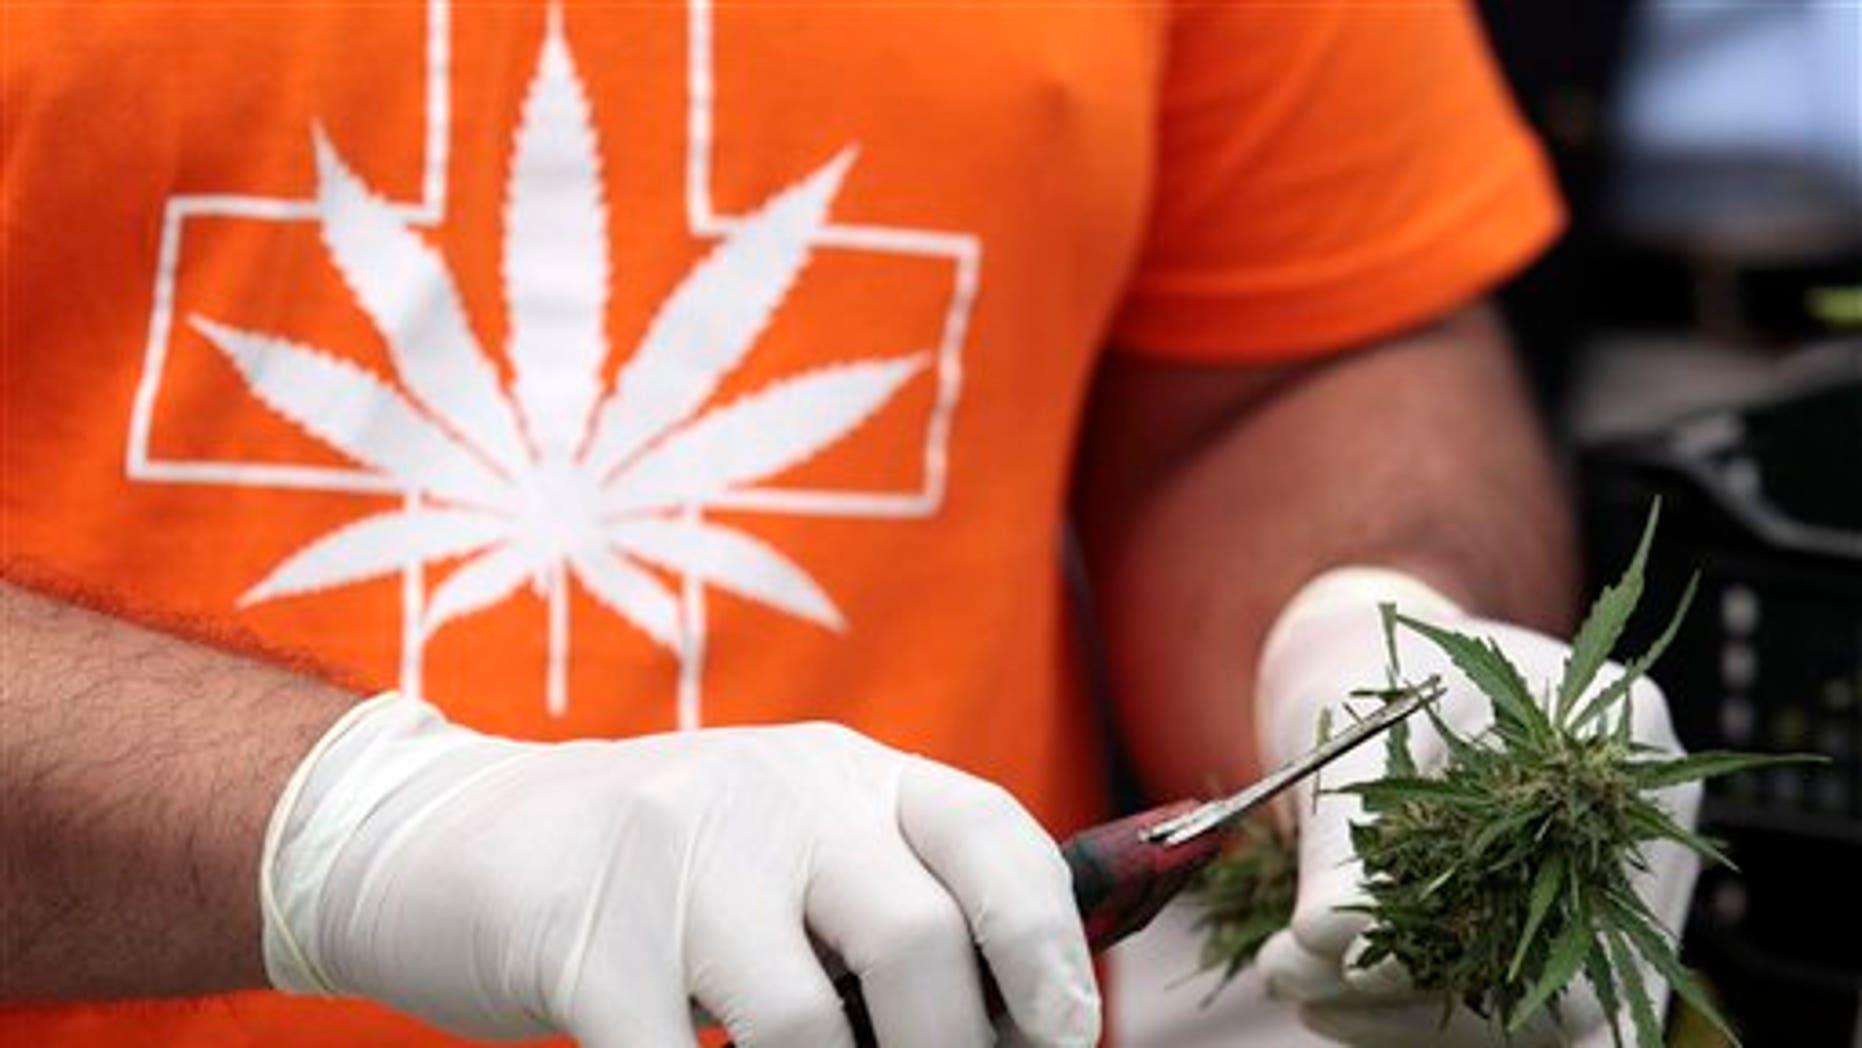 A man harvests a marijuana plant during a press presentation of a legal medicinal marijuana in the La Florida municipality of Santiago, Chile, Tuesday, April 7, 2015. (AP Photo/Luis Hidalgo)